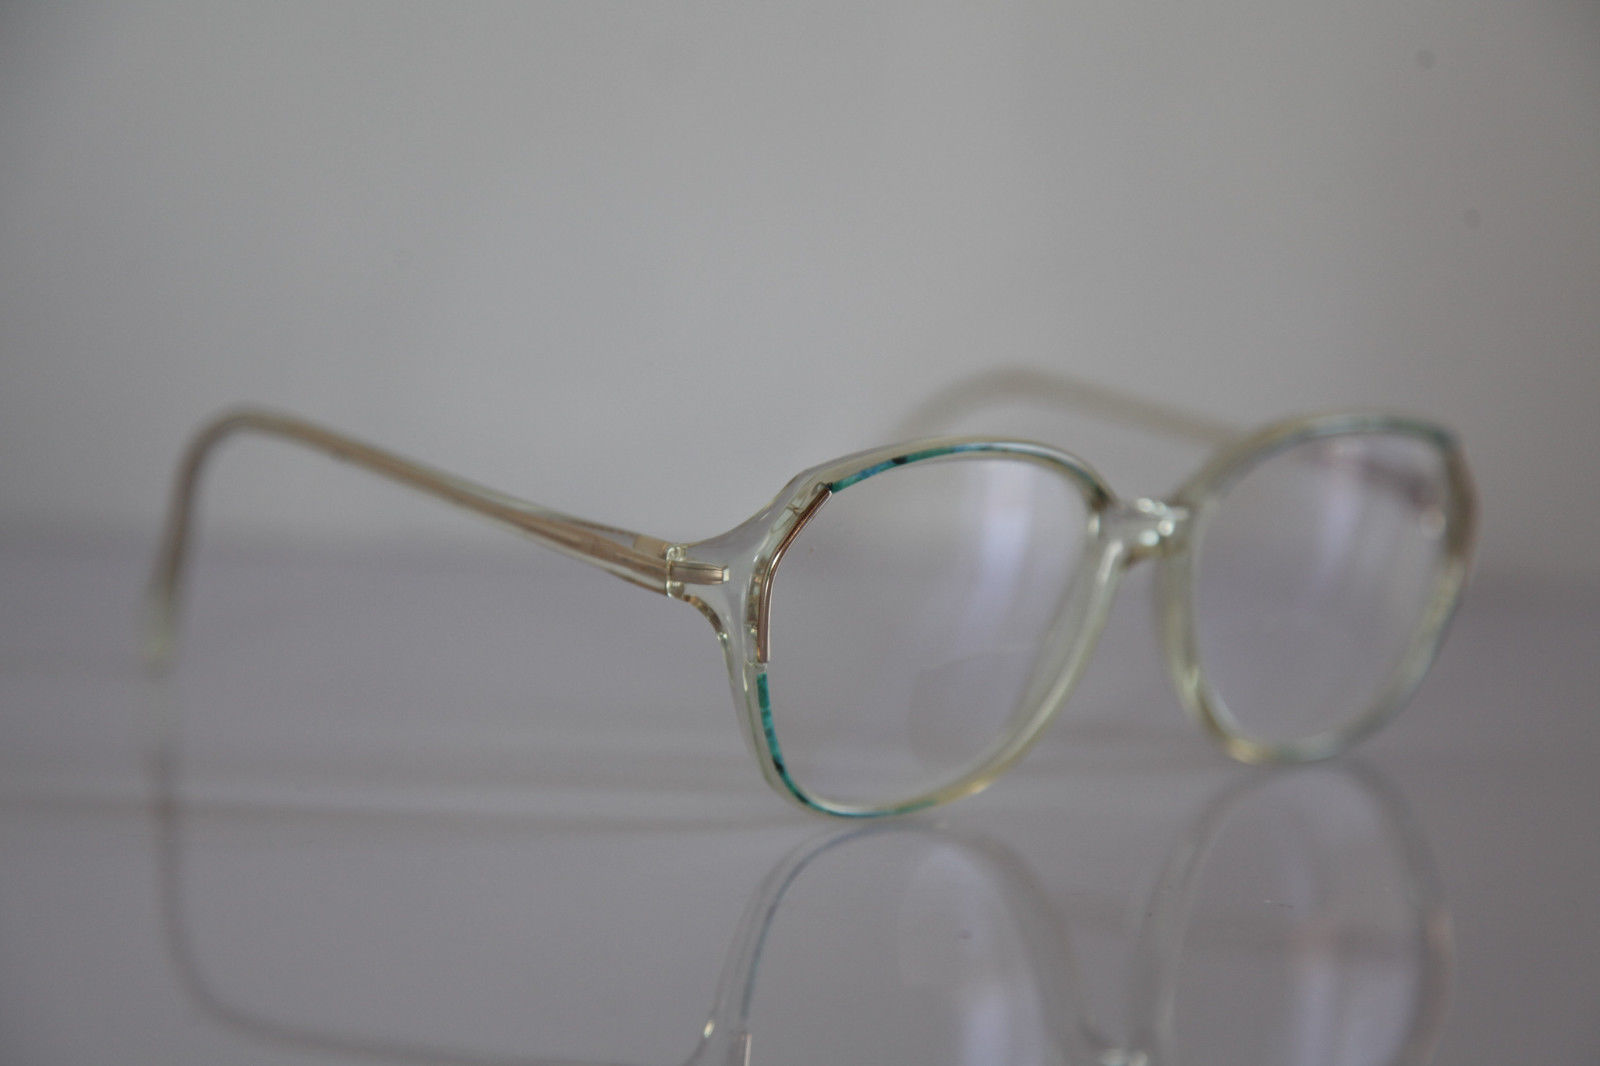 RODENSTOCK, Crystal, Blue, Frame,  RX-Able Prescription lenses. Germany